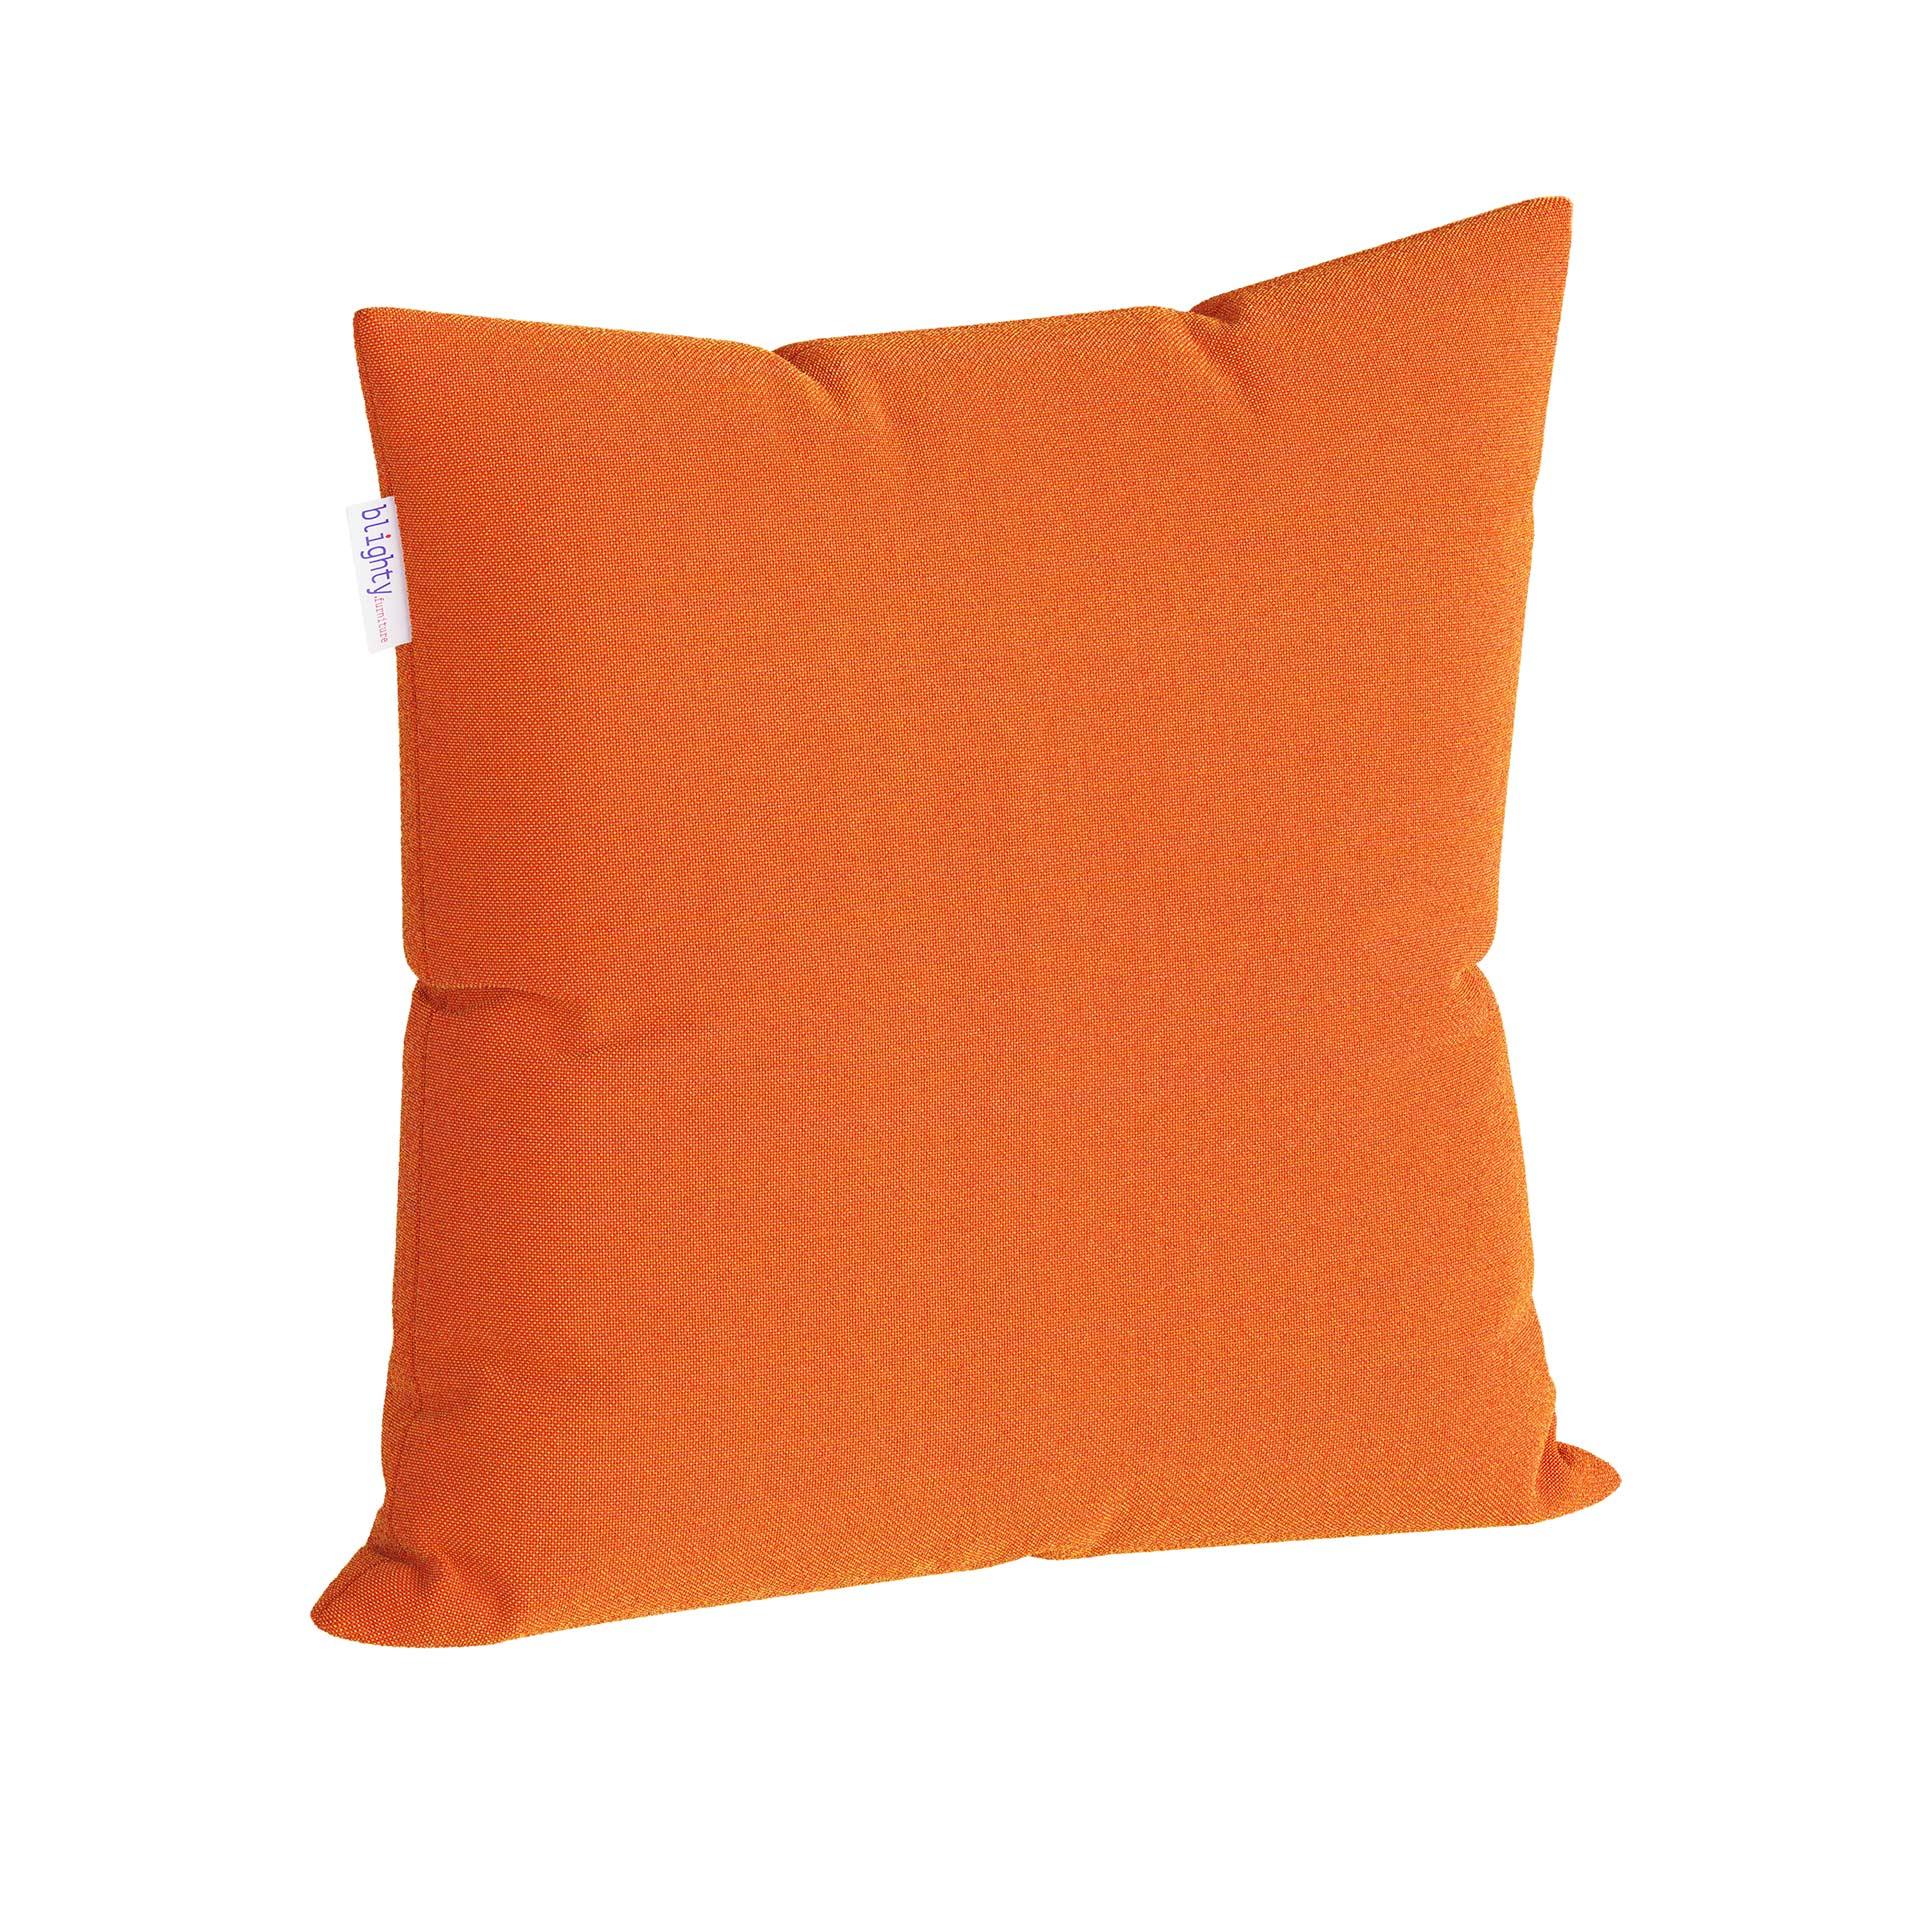 Scatter Square Pillow Corner View Orange